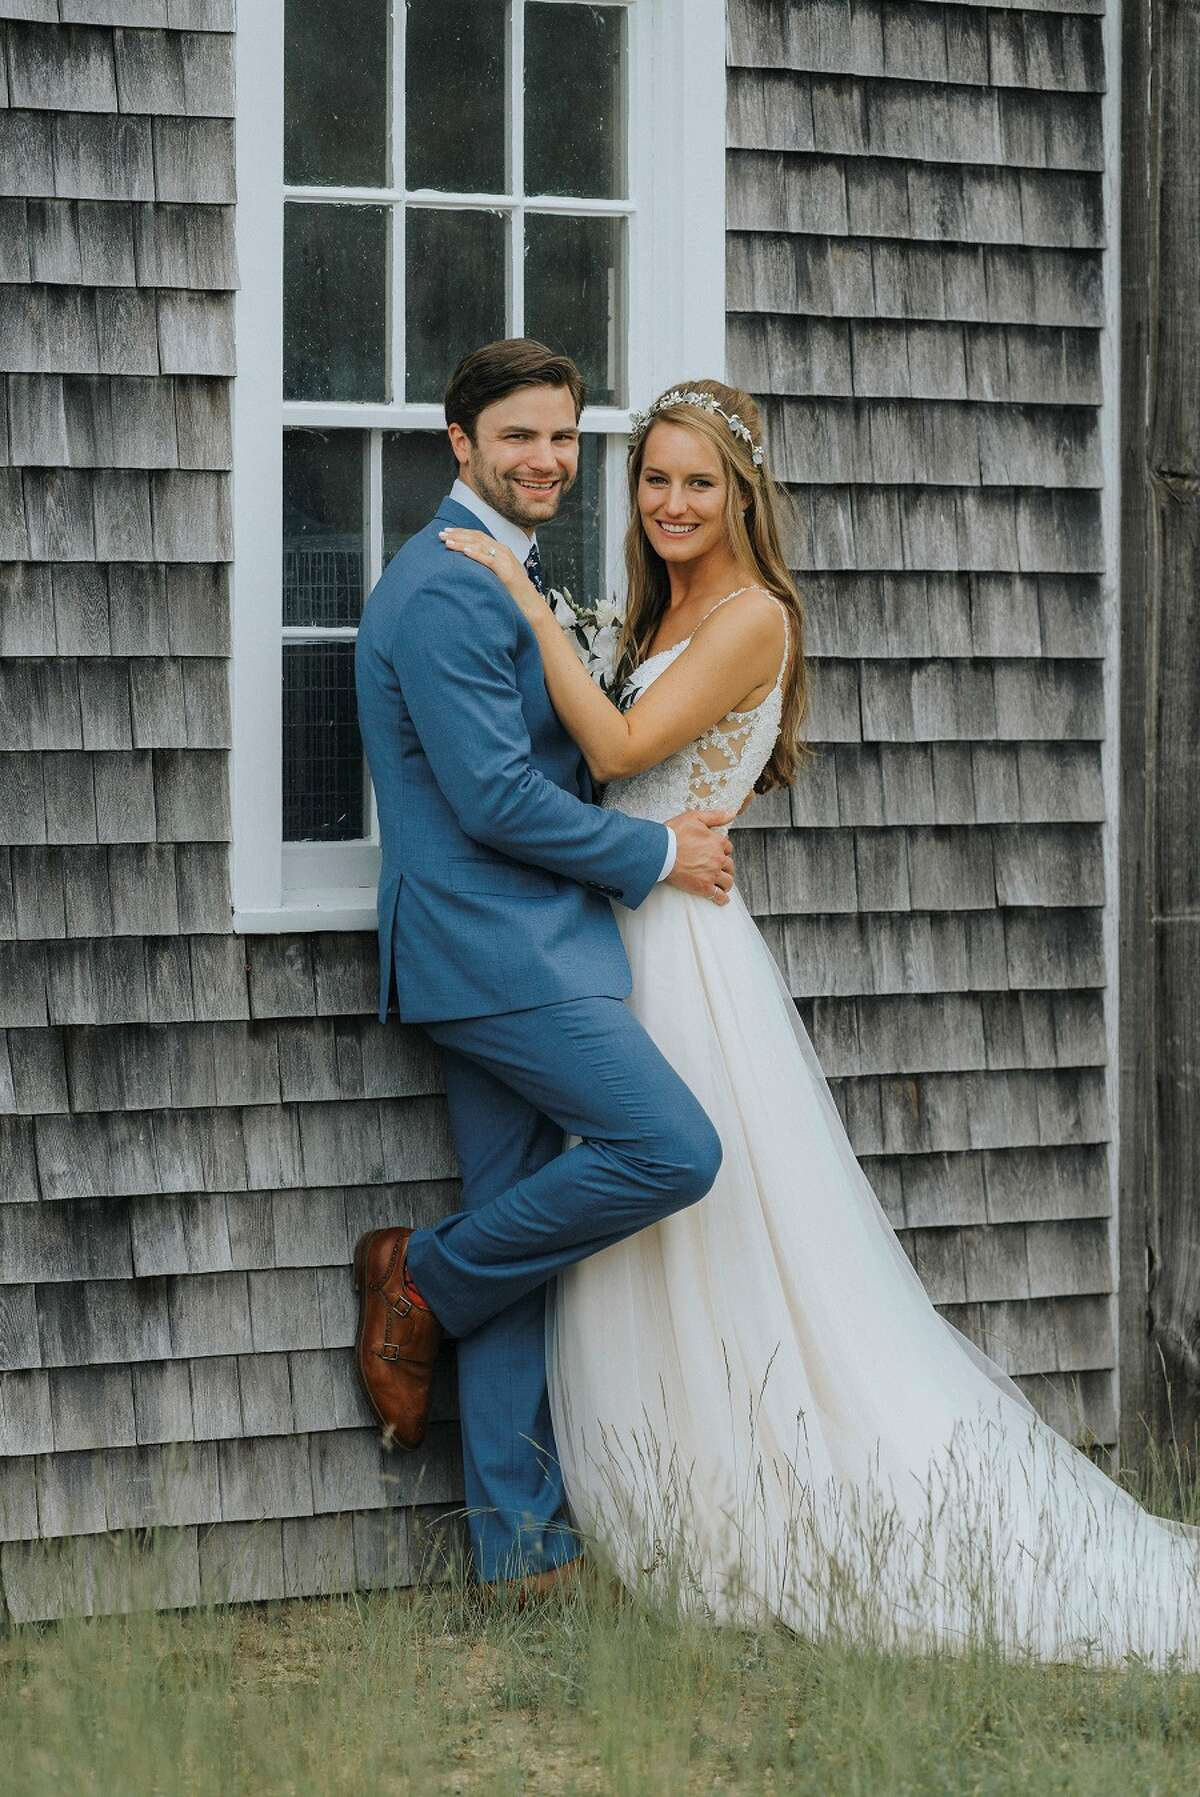 New Canaan: Brianna Ozimek recently wed Patrick Ready in Martha's Vineyard. Brianna Ozimek, Patrick Ready. - Photo by David Welch